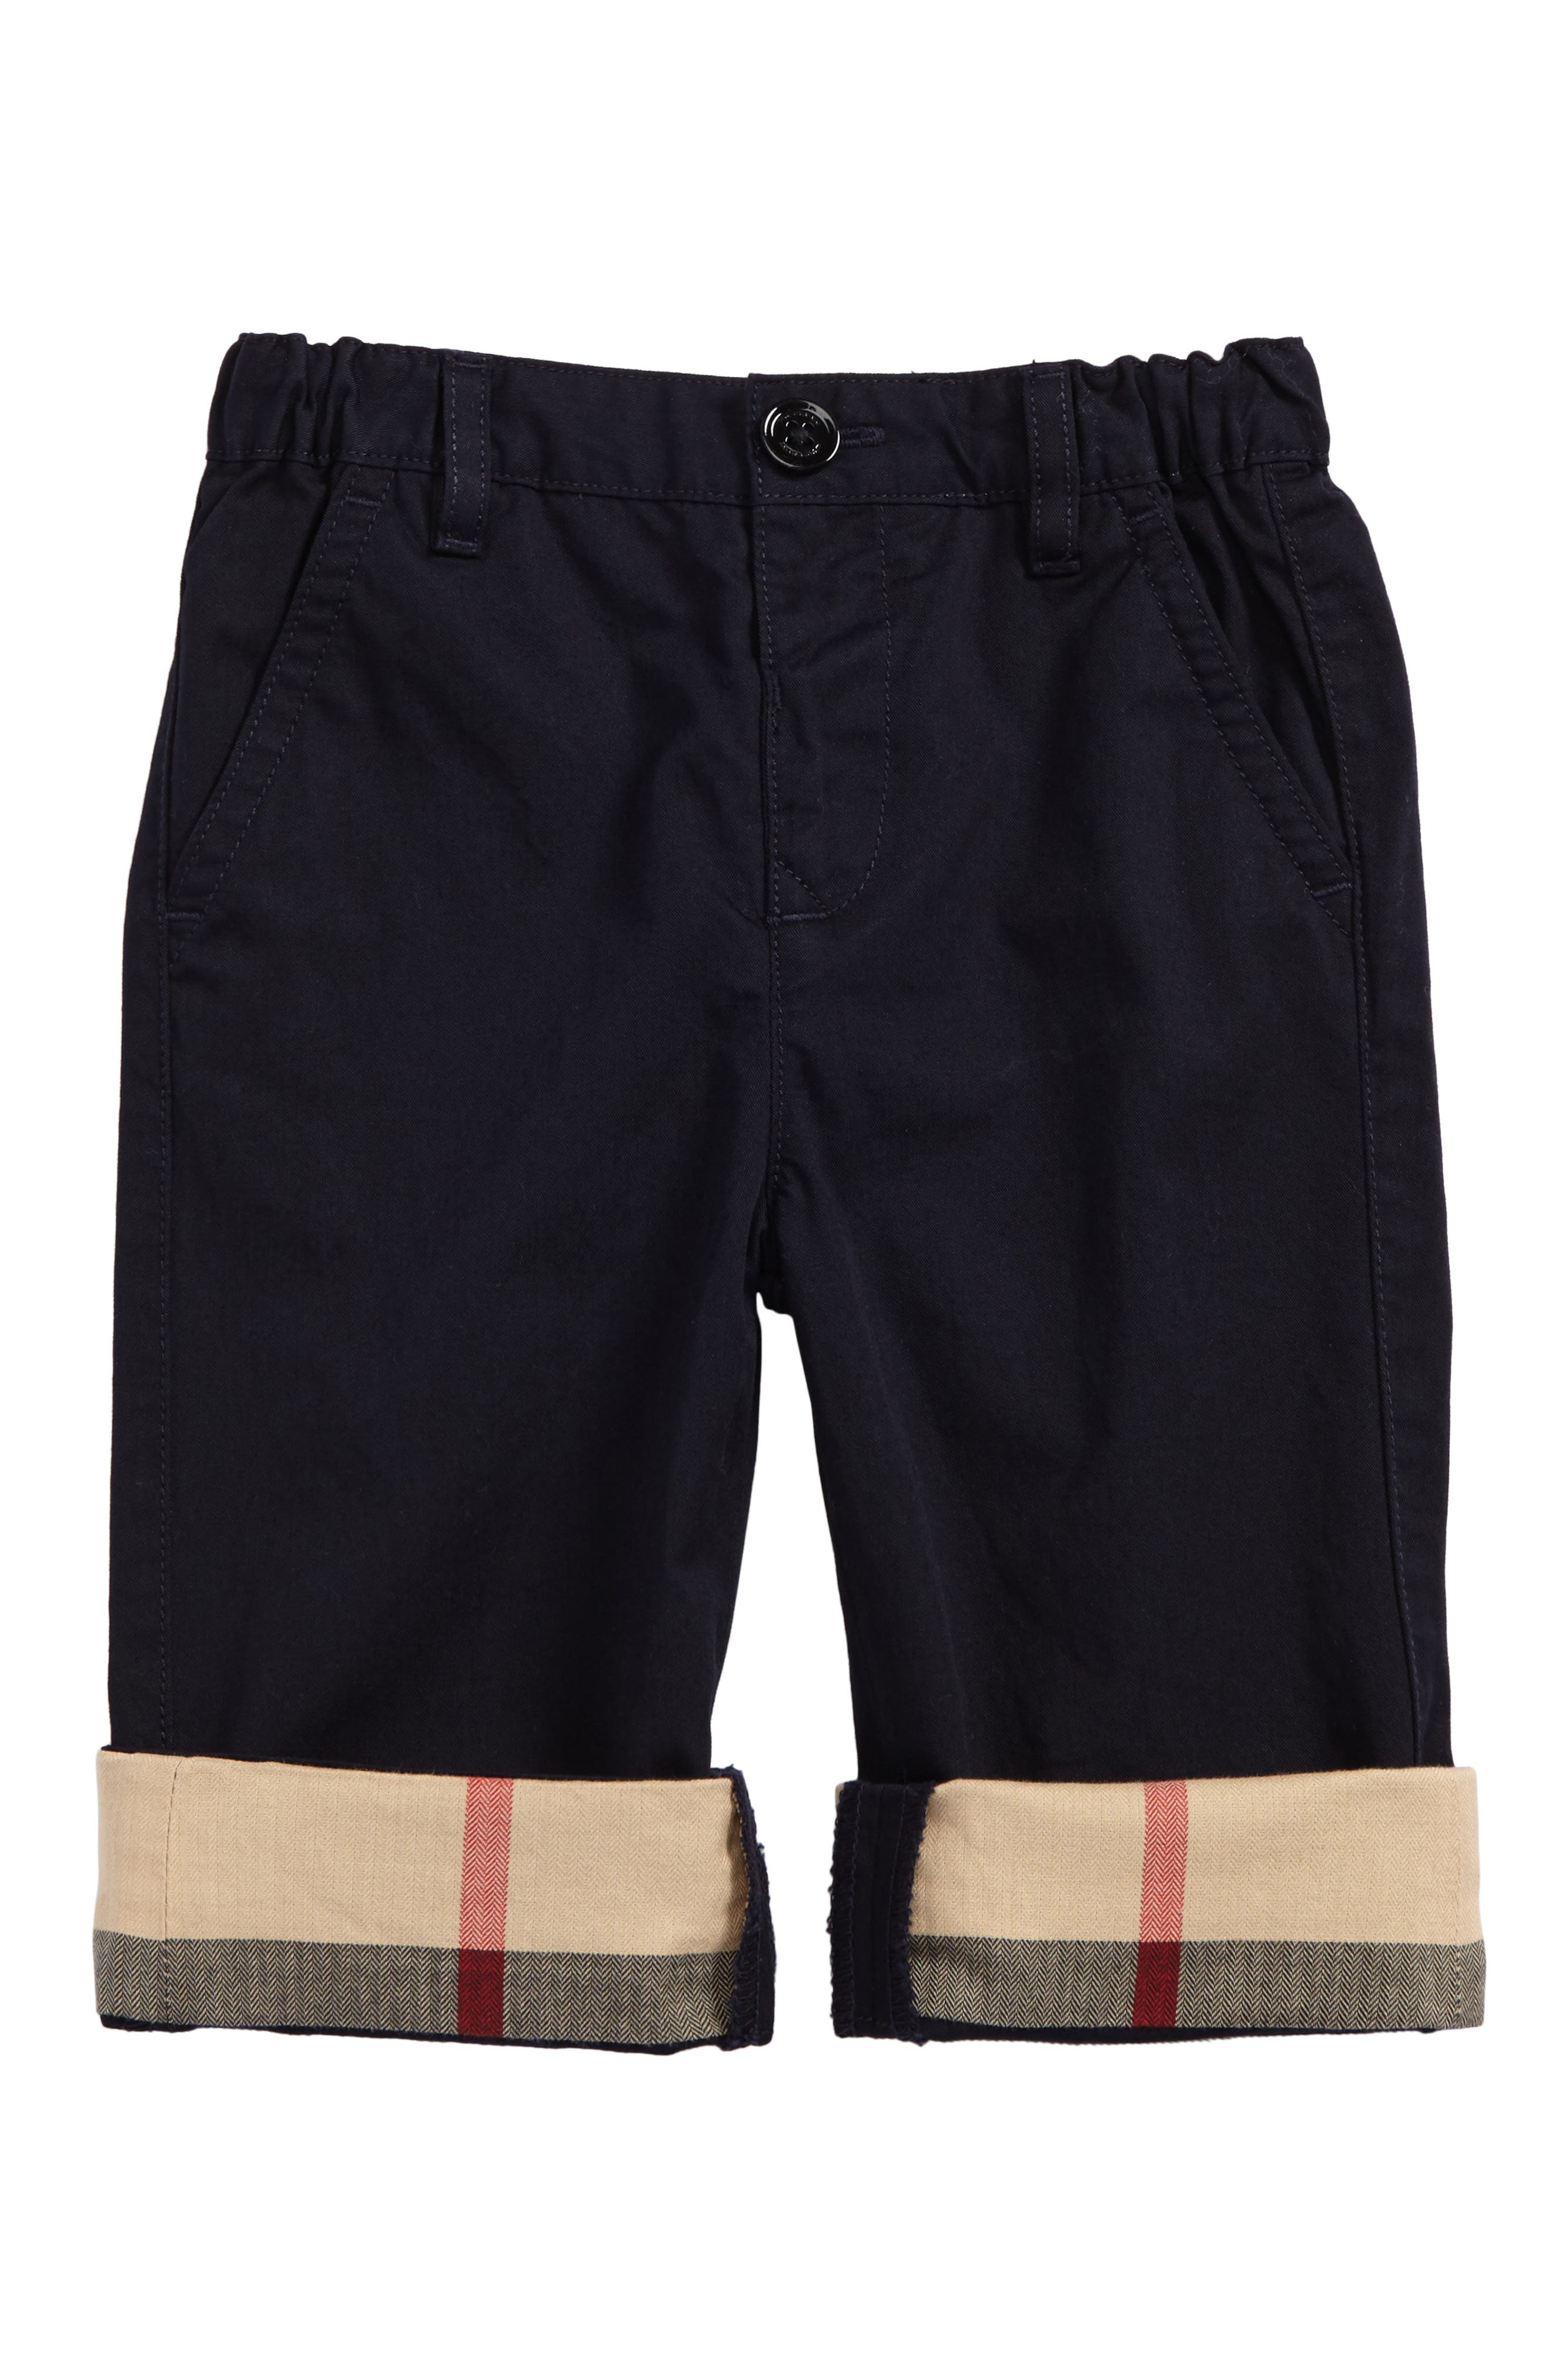 Burberry Ricky Check Cuff Chino Pants (Baby Boys)